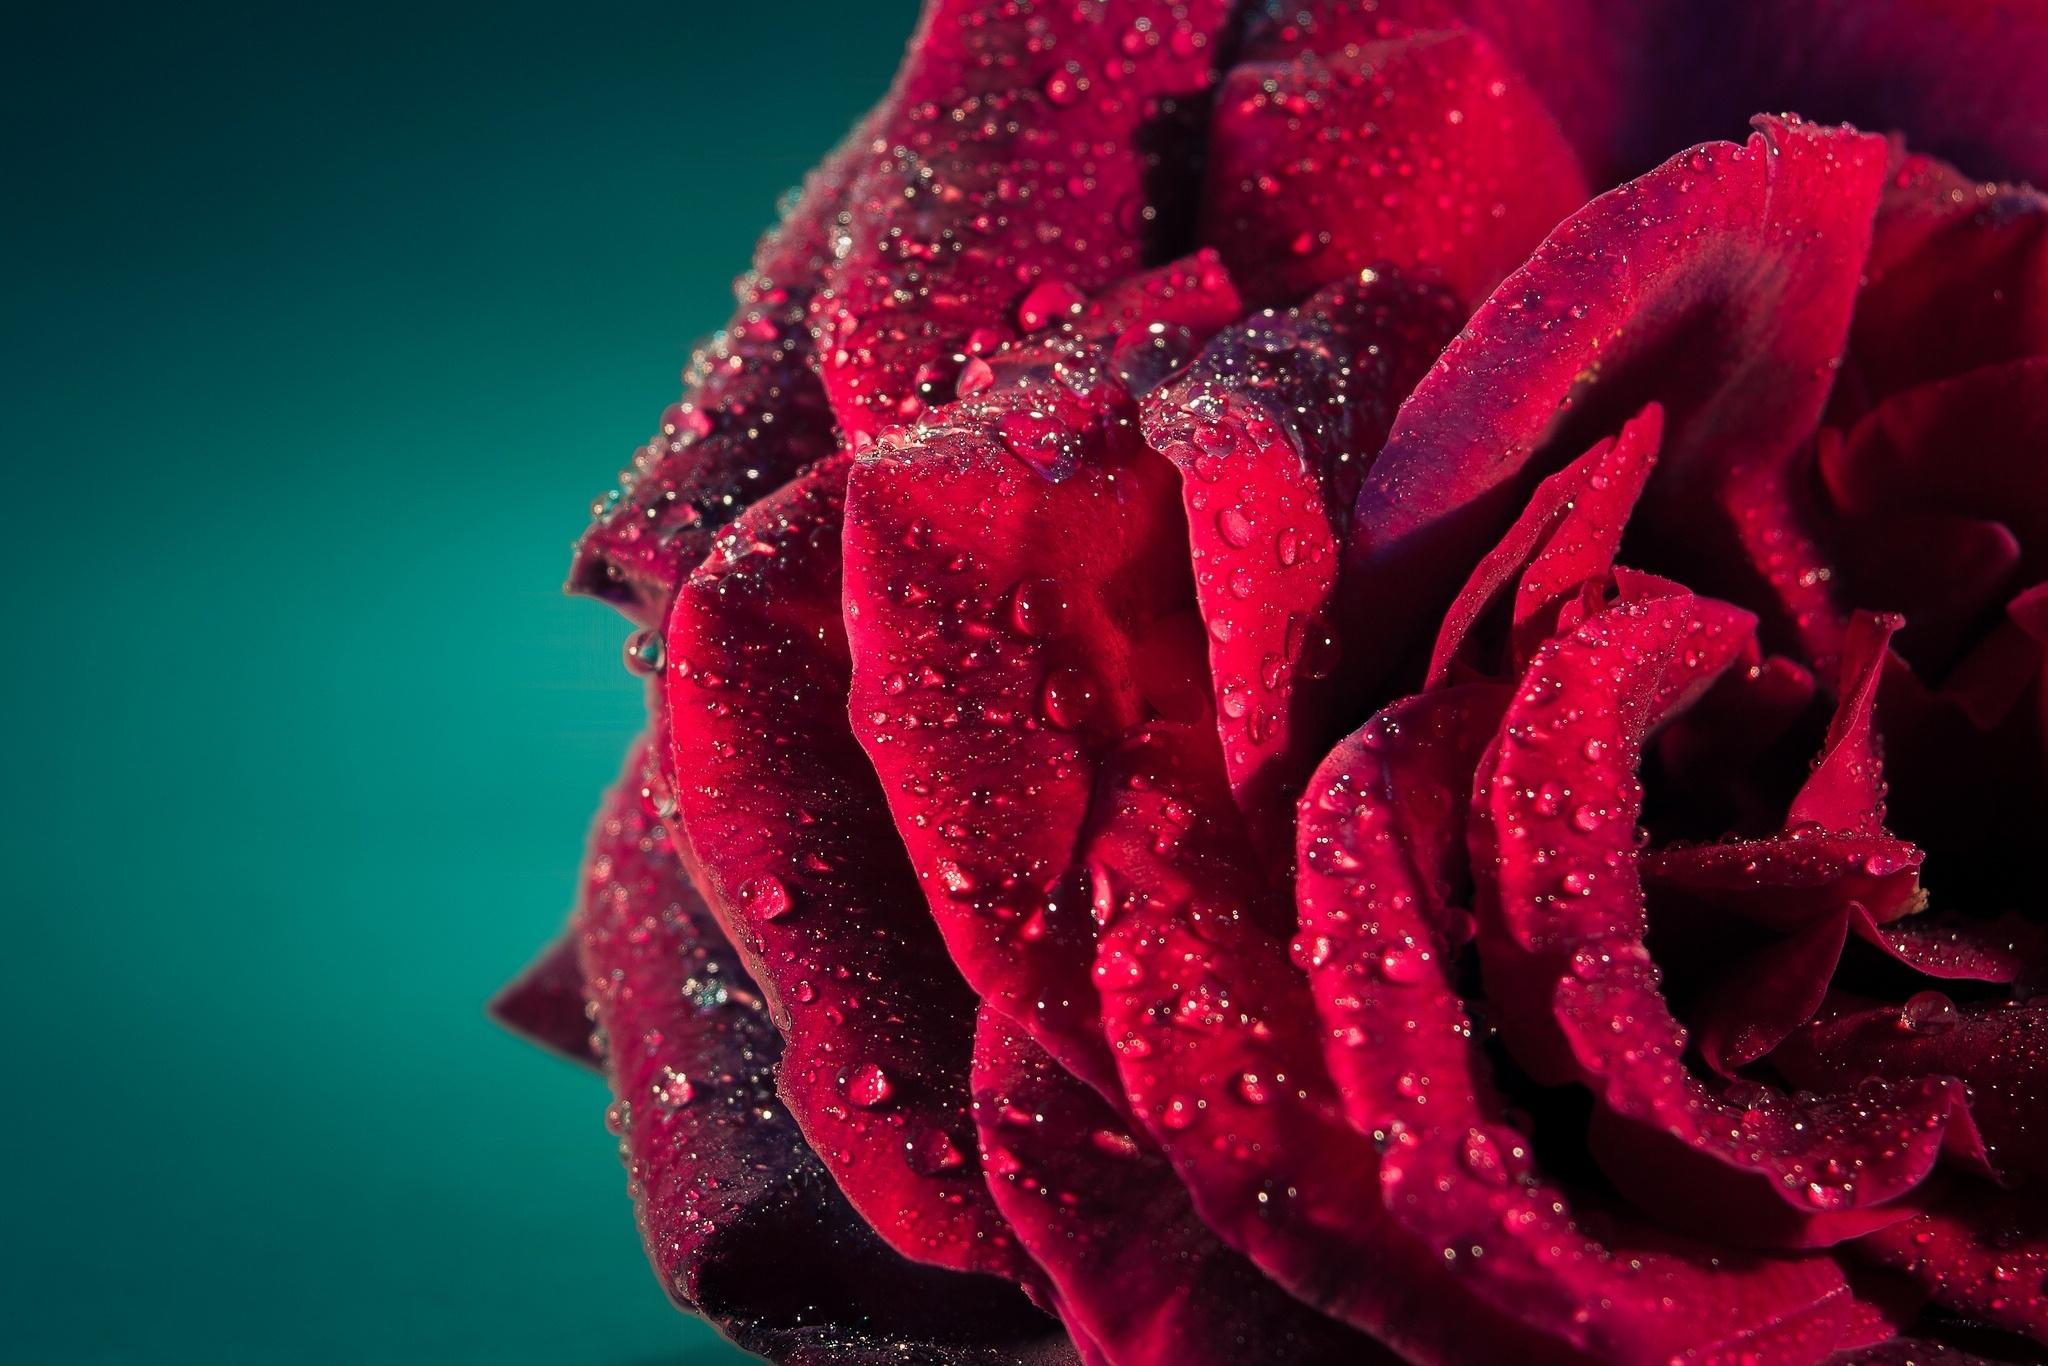 80935 download wallpaper Macro, Rose Flower, Rose, Petals, Drops screensavers and pictures for free